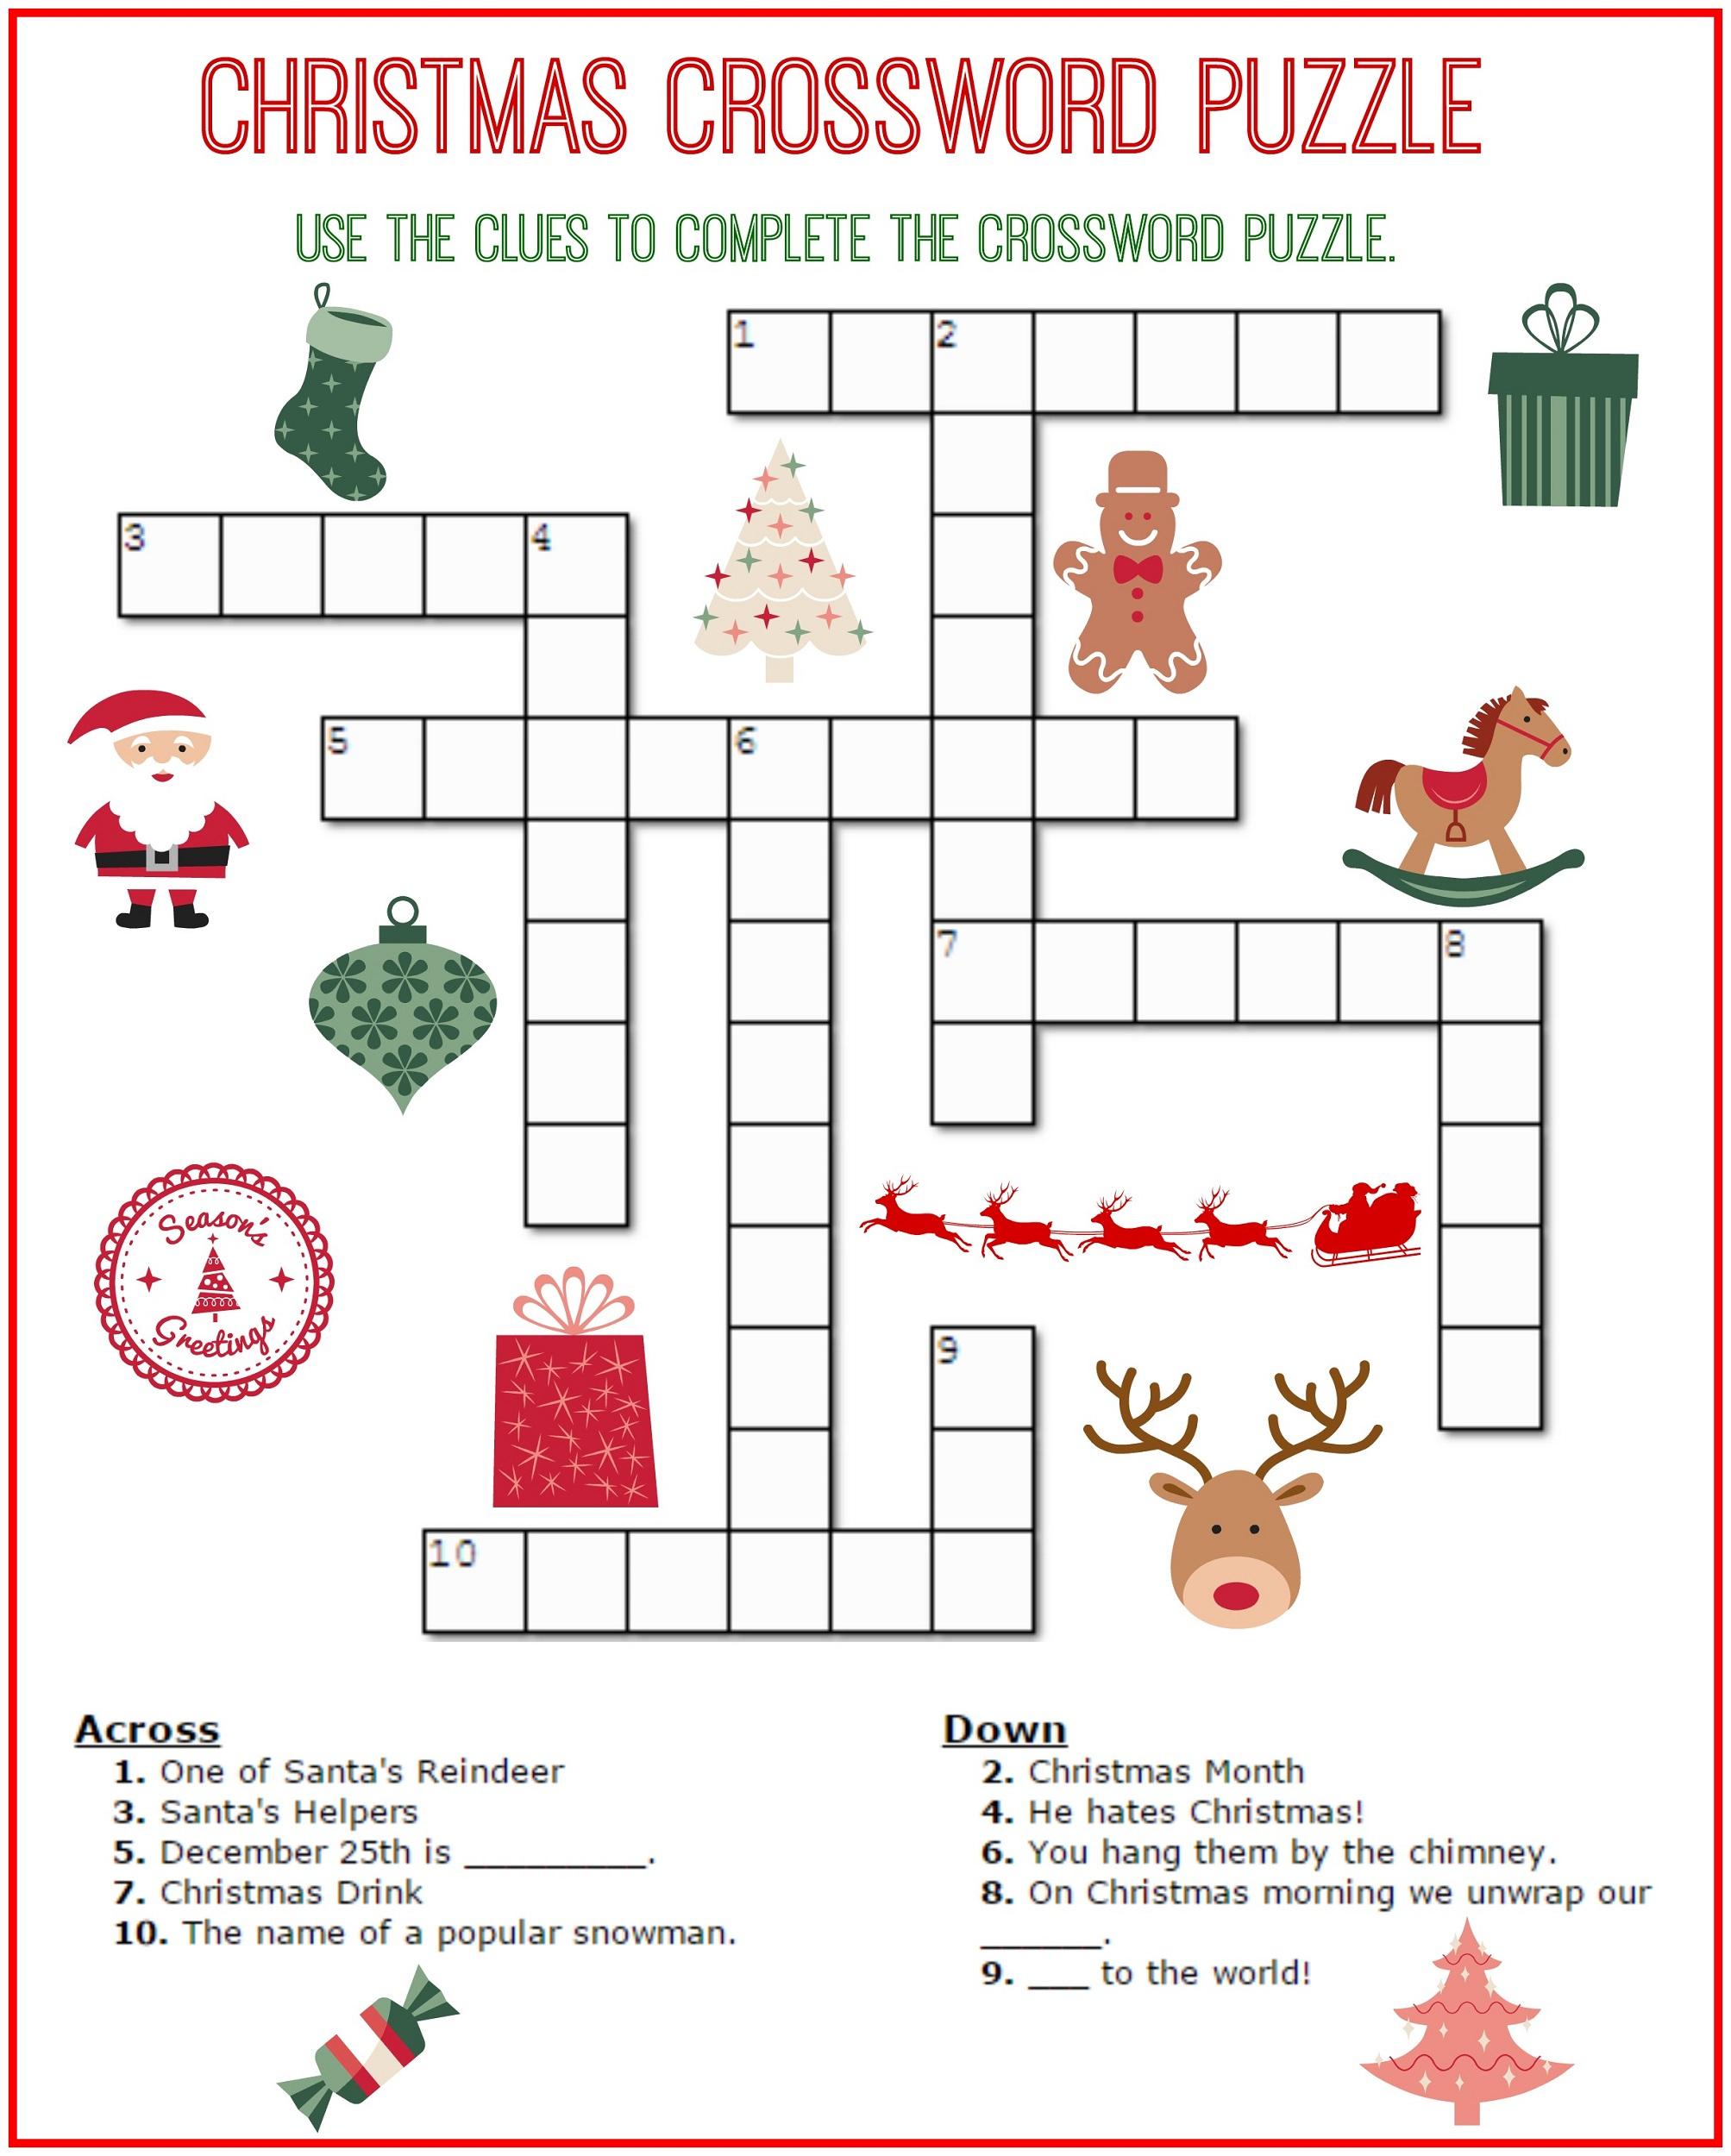 Crossword Puzzle Kids Printable 2017 | Kiddo Shelter - Crossword Puzzles For Kindergarten Free Printable